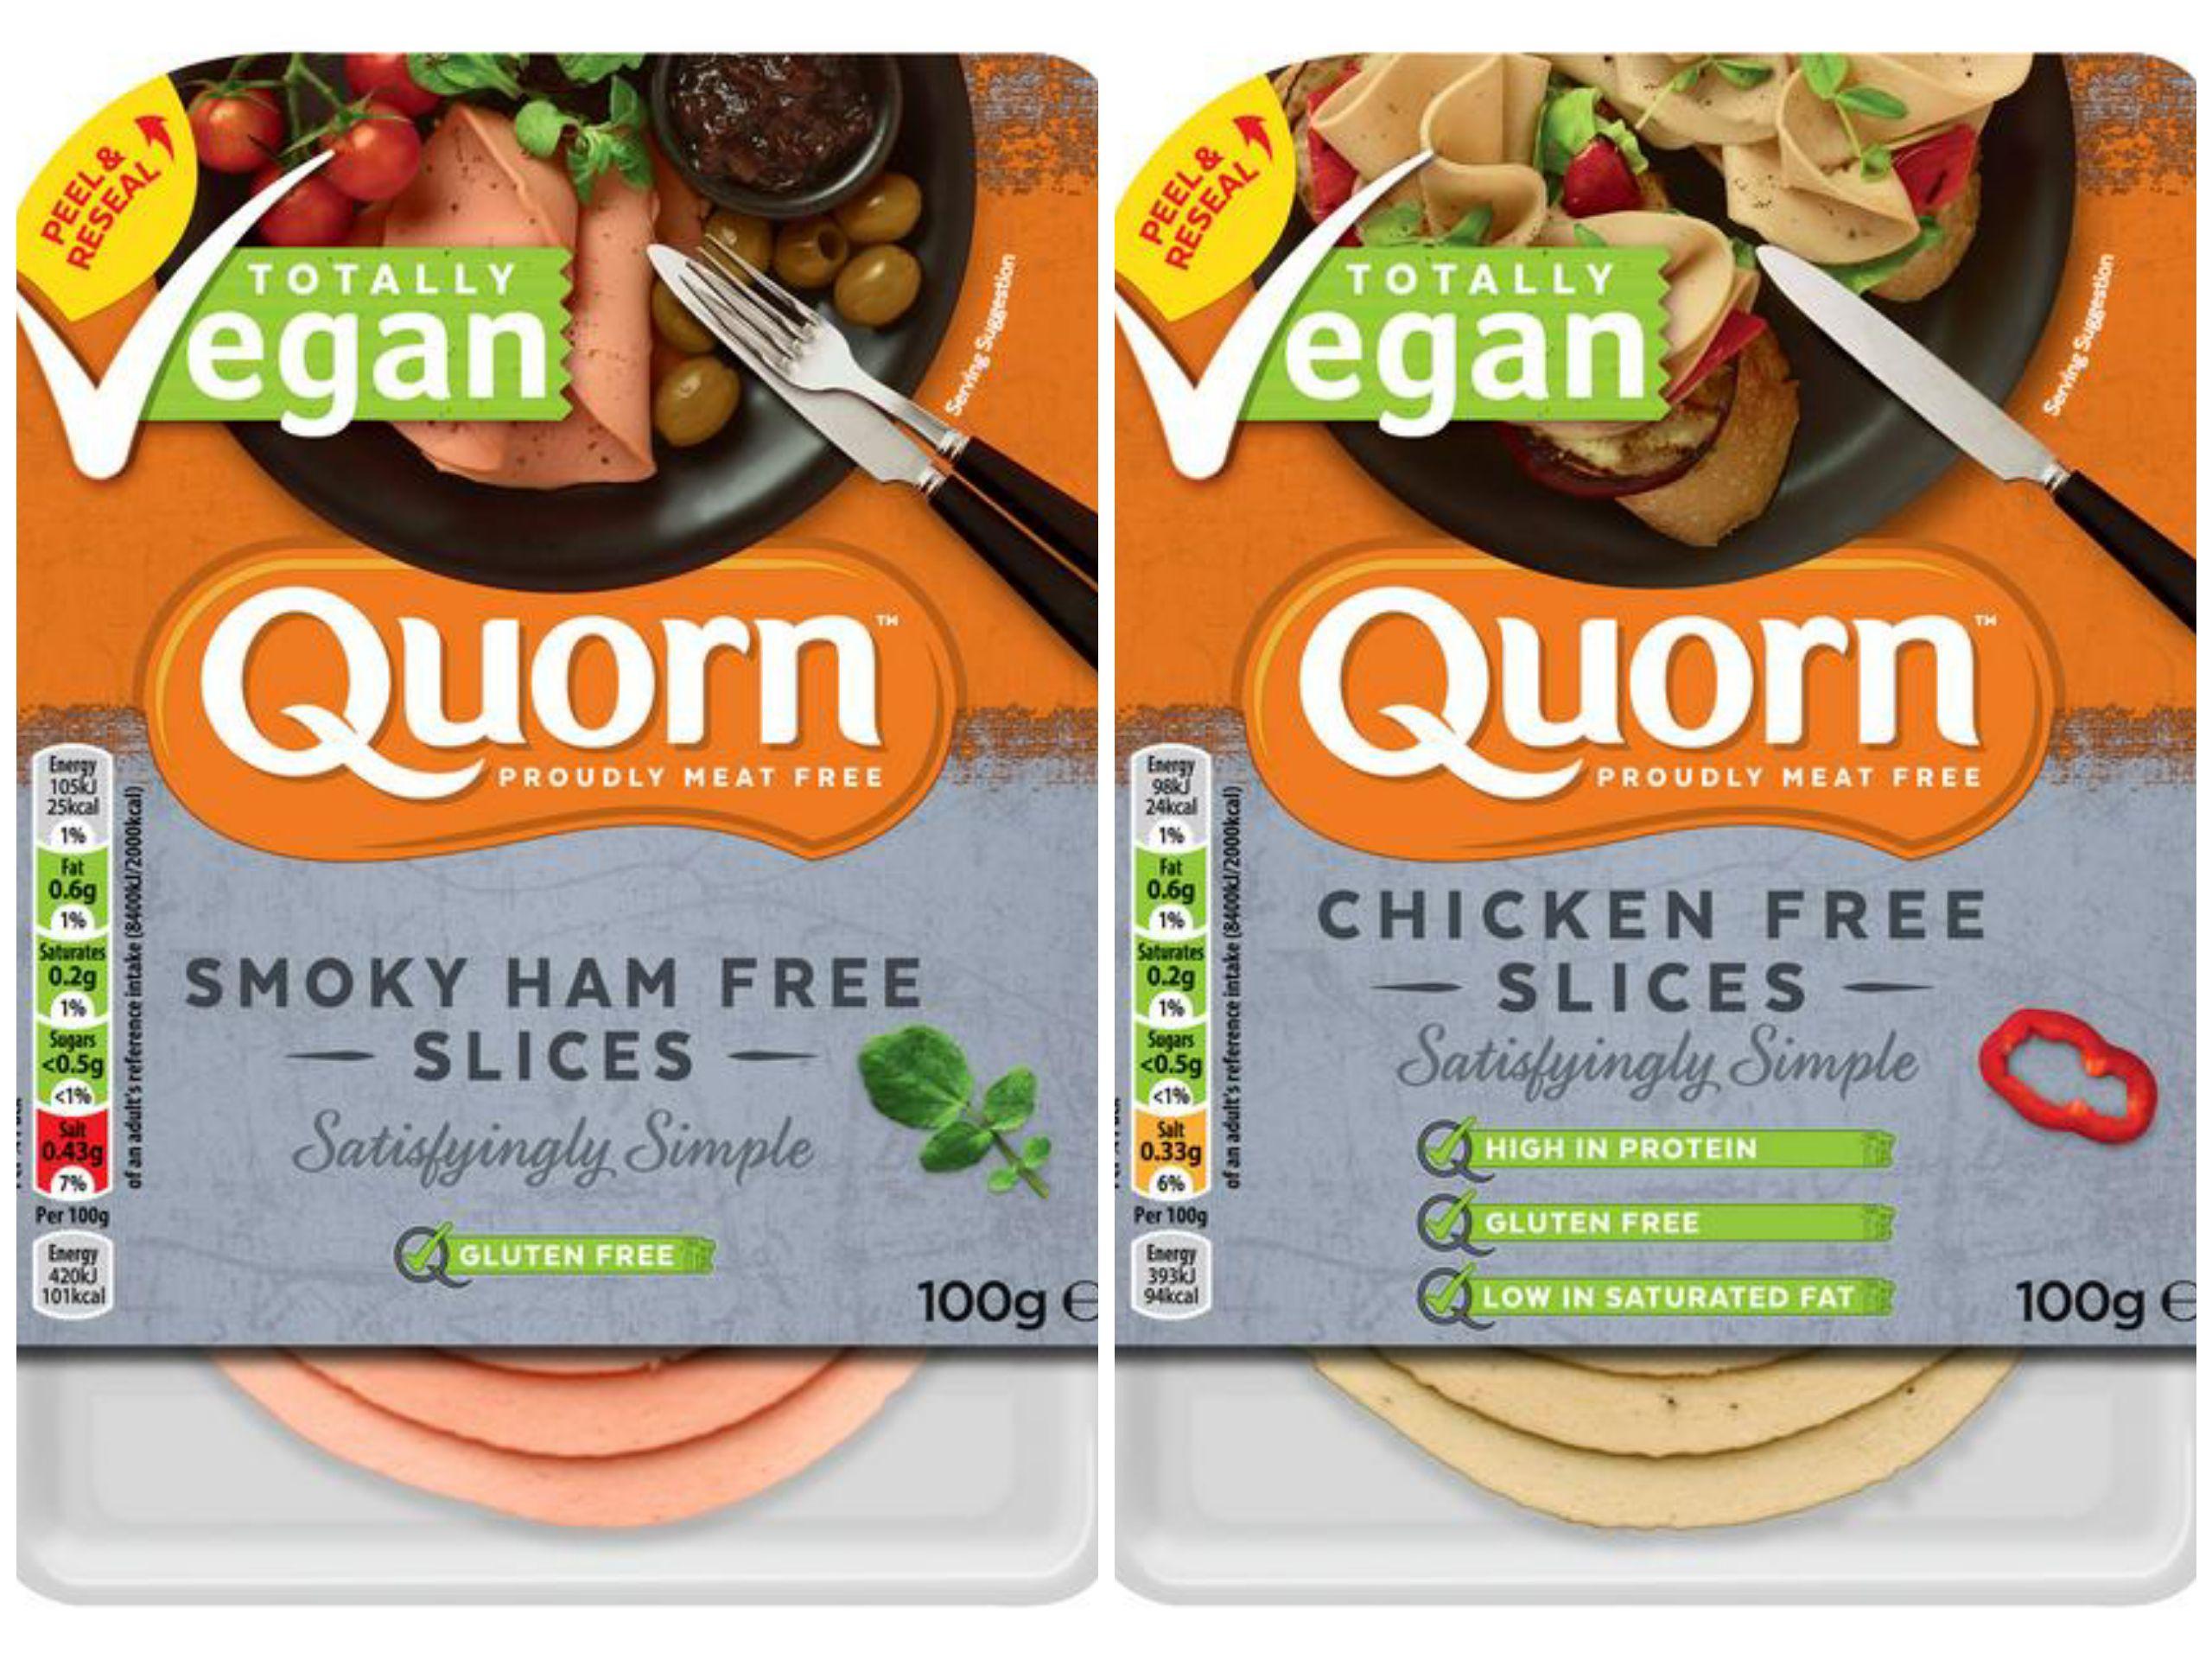 Quorn Vegan Smoky Ham Free Slices 100g or Quorn Vegan Chicken Free Slices 100g £1.50 at Sainsbury's